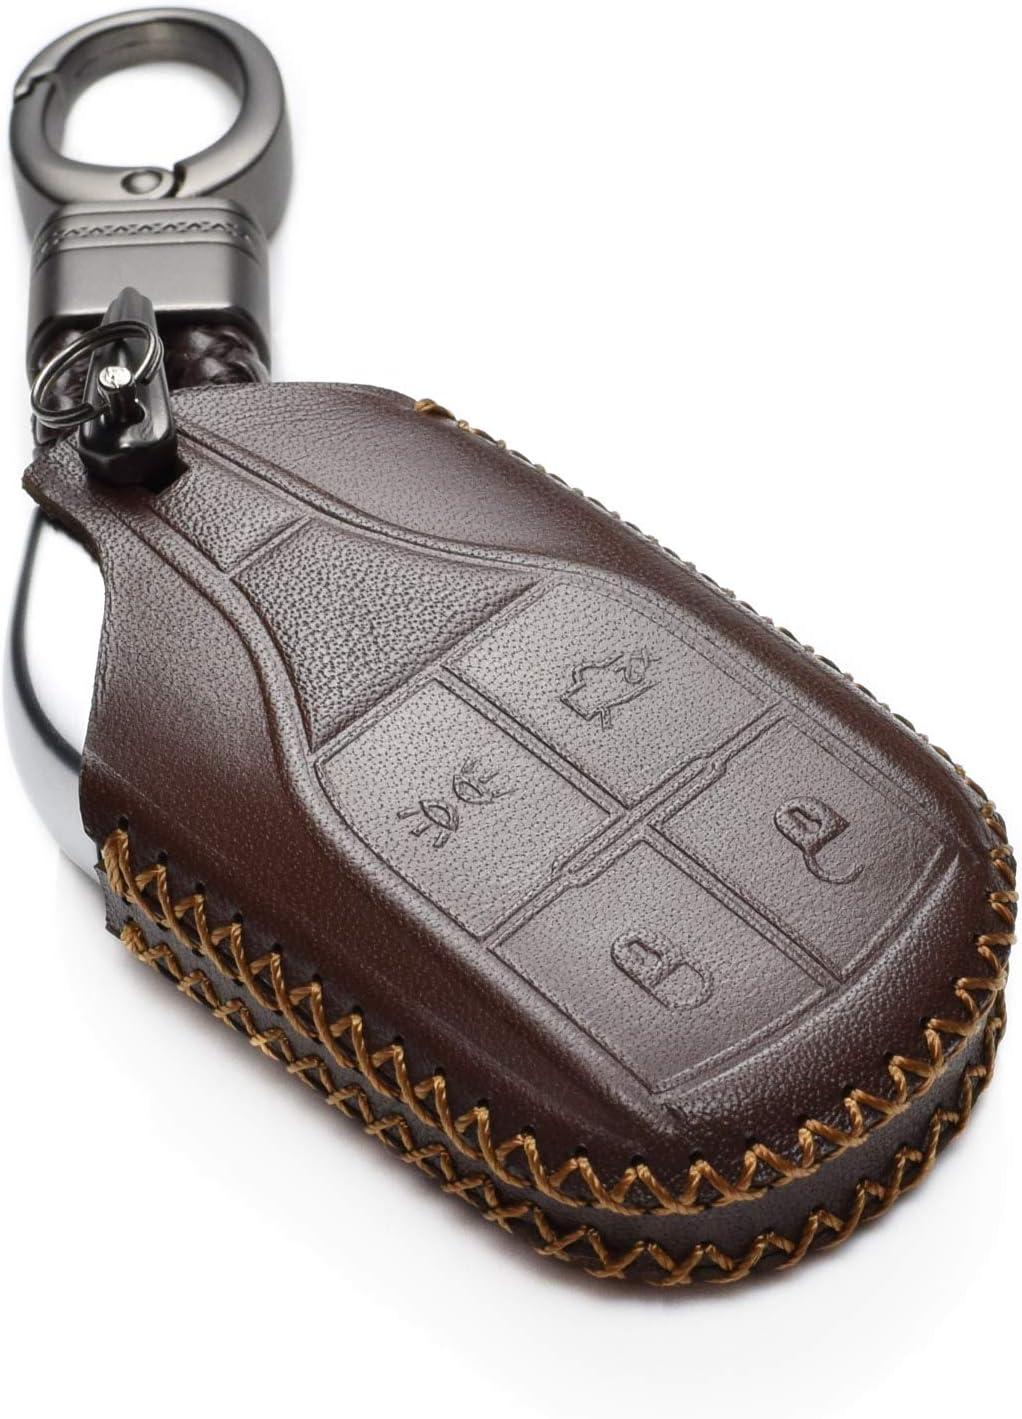 Levante Vitodeco Genuine Leather Keyless Smart Key Fob Case Cover with Key Chain for Maserati Ghibli Quattroporte Light Button, Brown